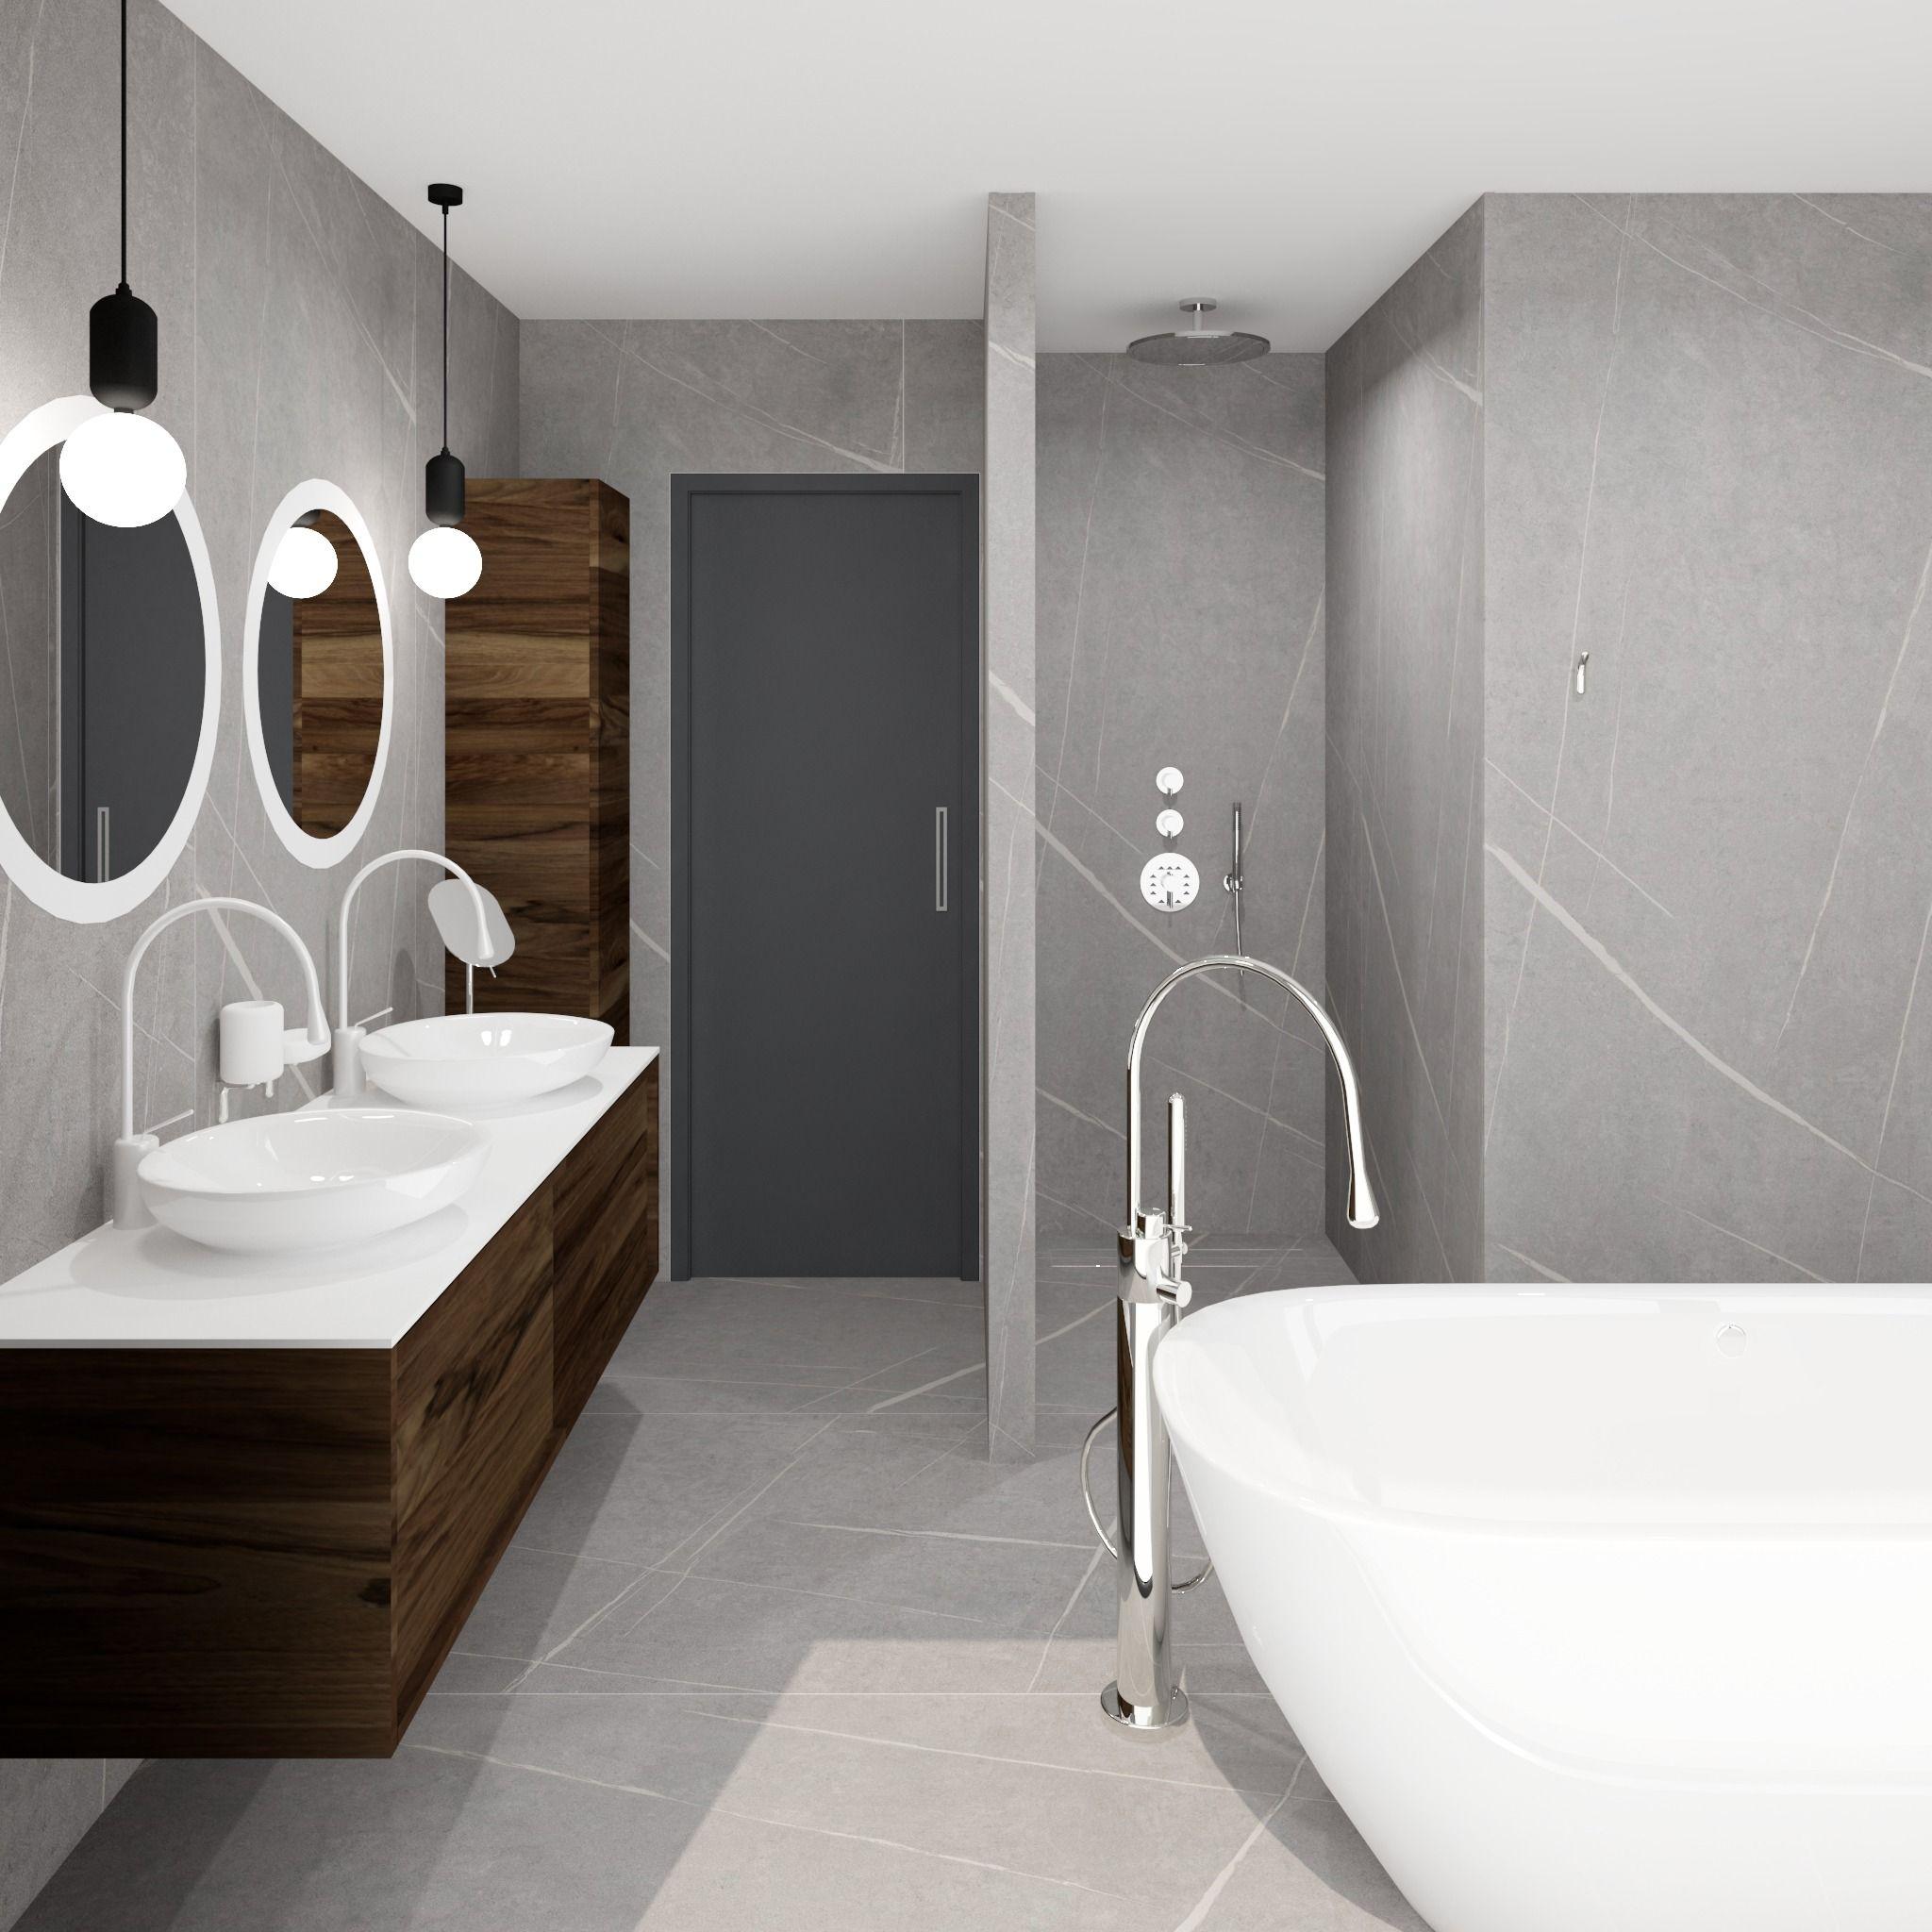 Projet Salle De Bain 3d Wallpaper Hd